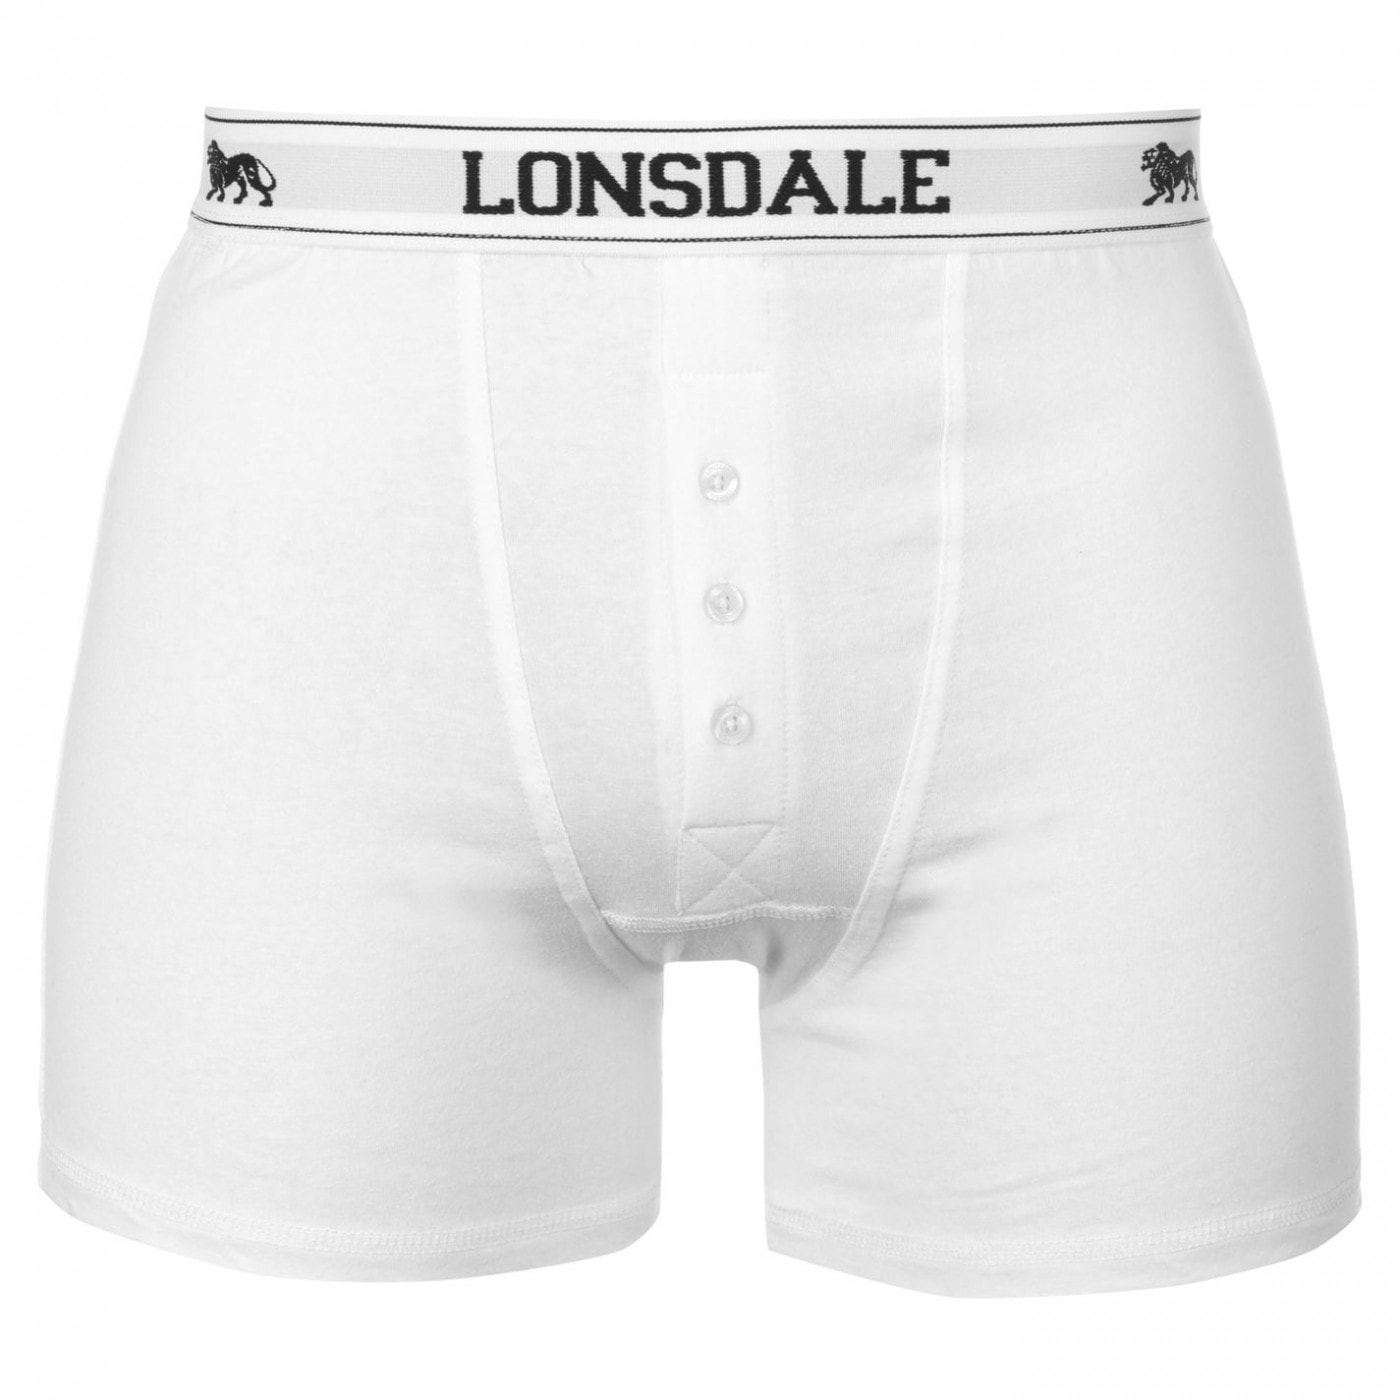 Férfi Boxeralsó Lonsdale 2 Pack